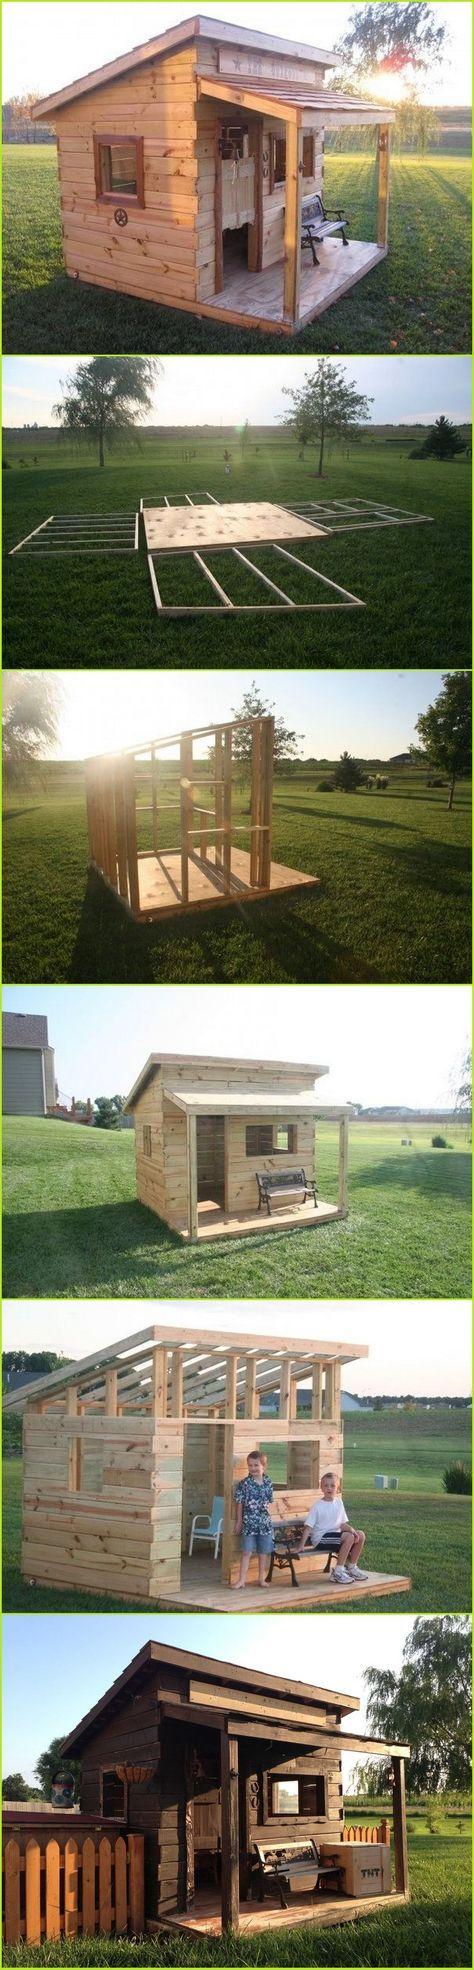 best 25 kid forts ideas on pinterest backyard fort wooden fort